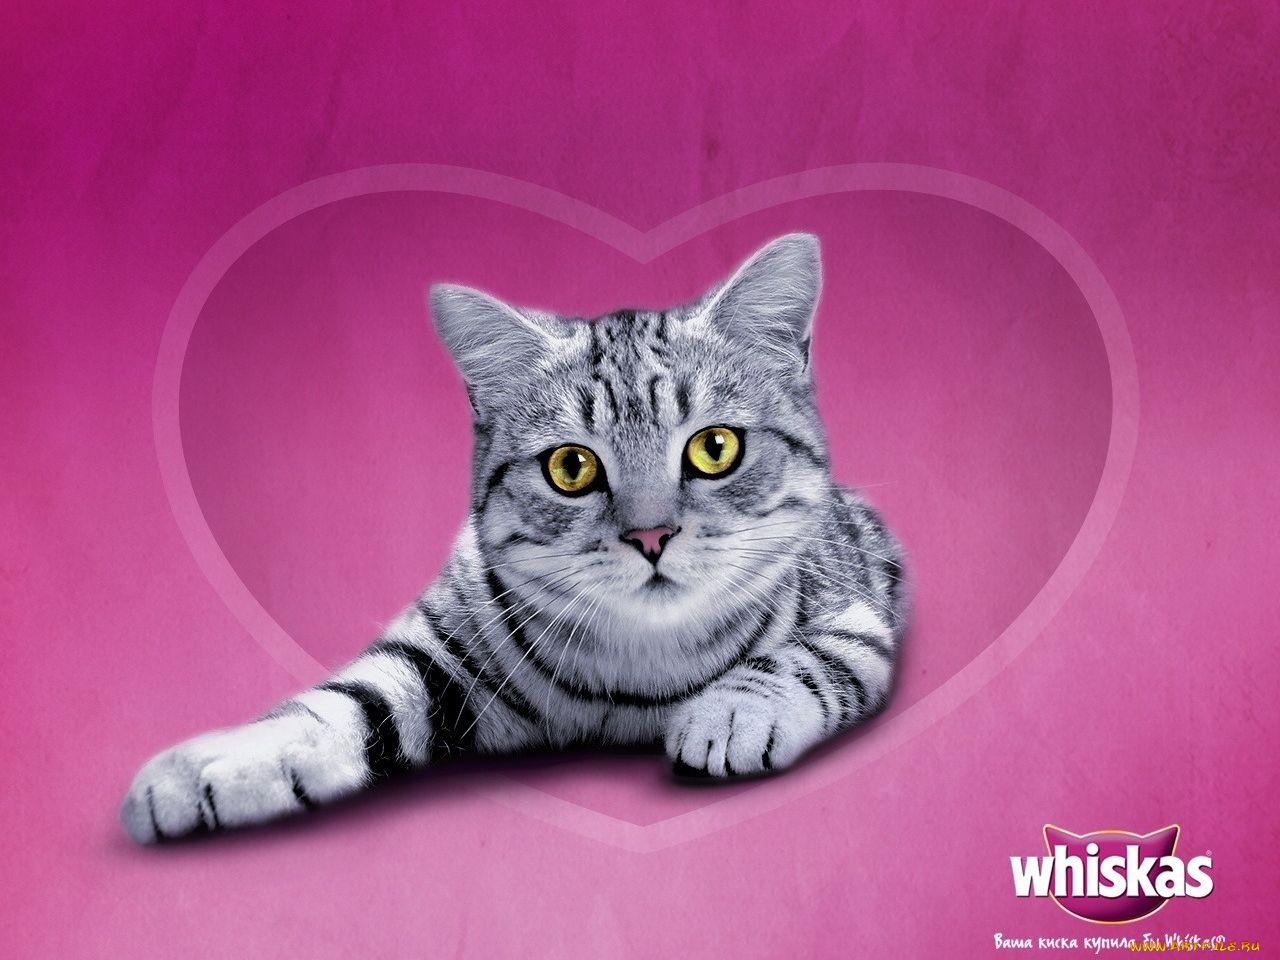 Вискас картинки с кошками